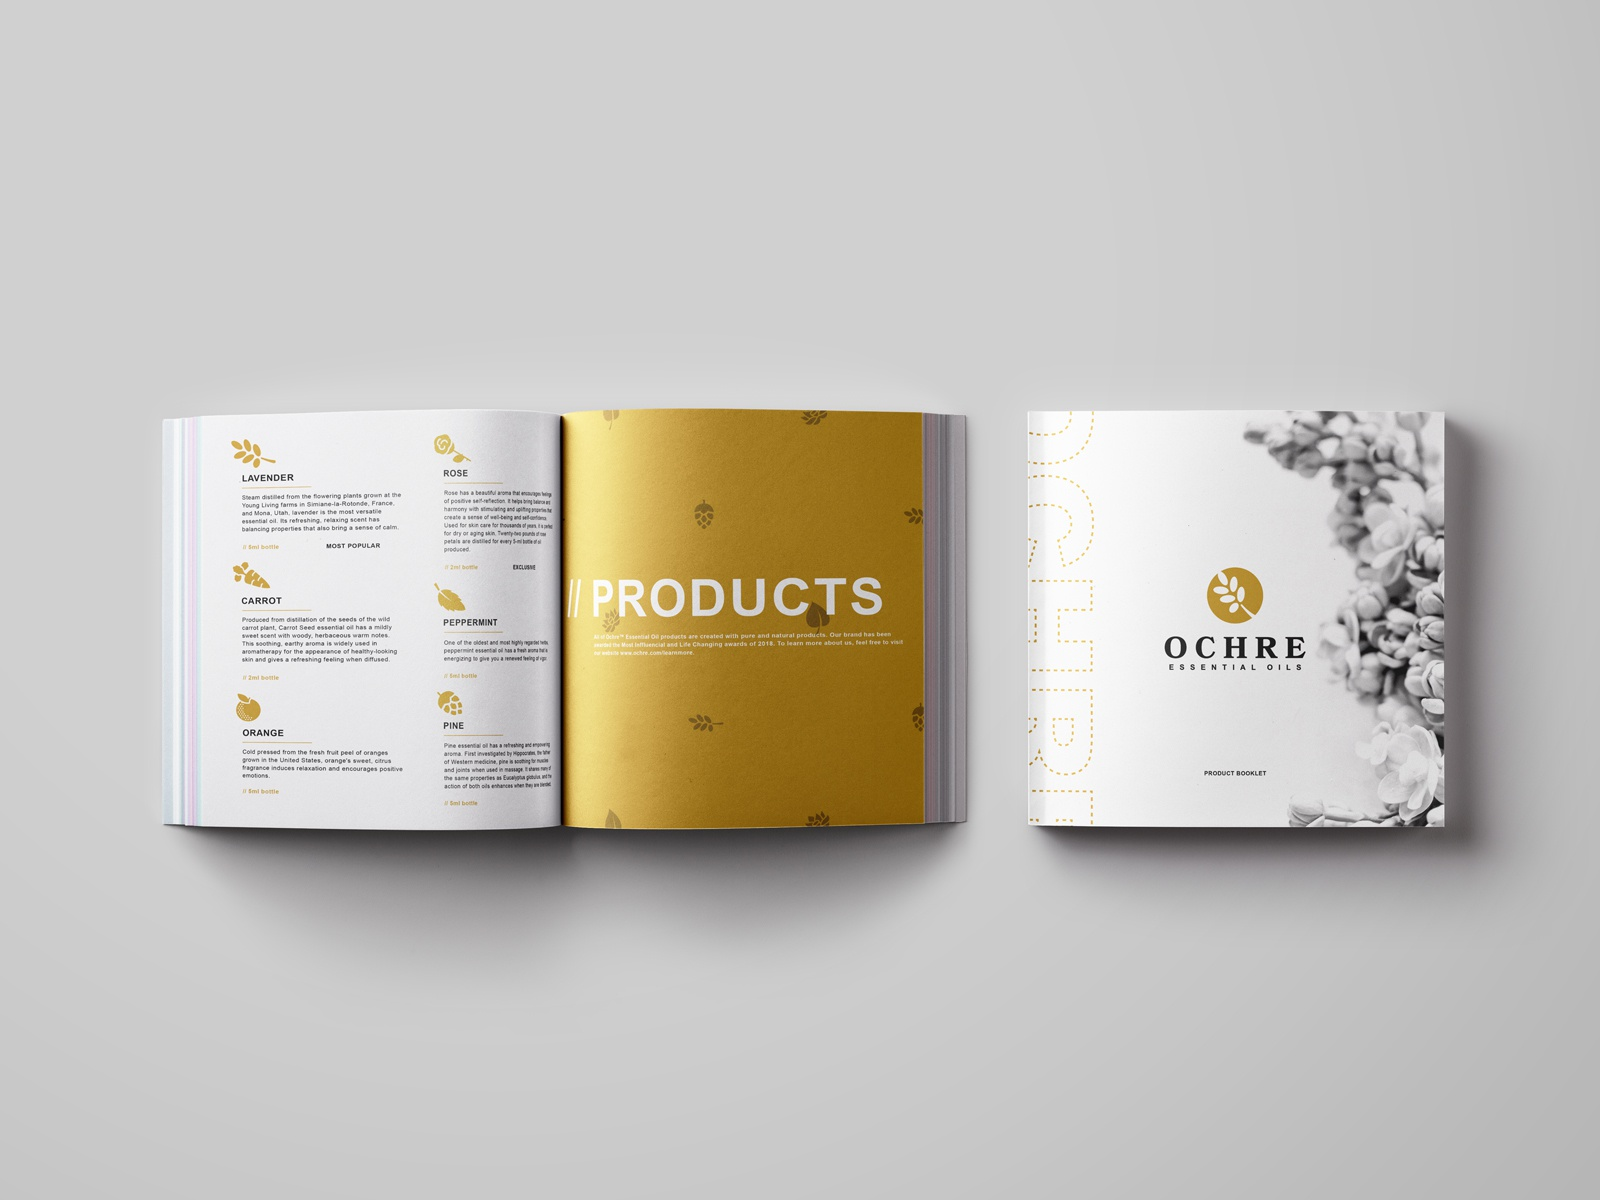 Ochre Product Booklet booklets editoral branding typography vector illustration inspiration post illustrator gfx graphics design logo brochure design booklet product booklet ochre